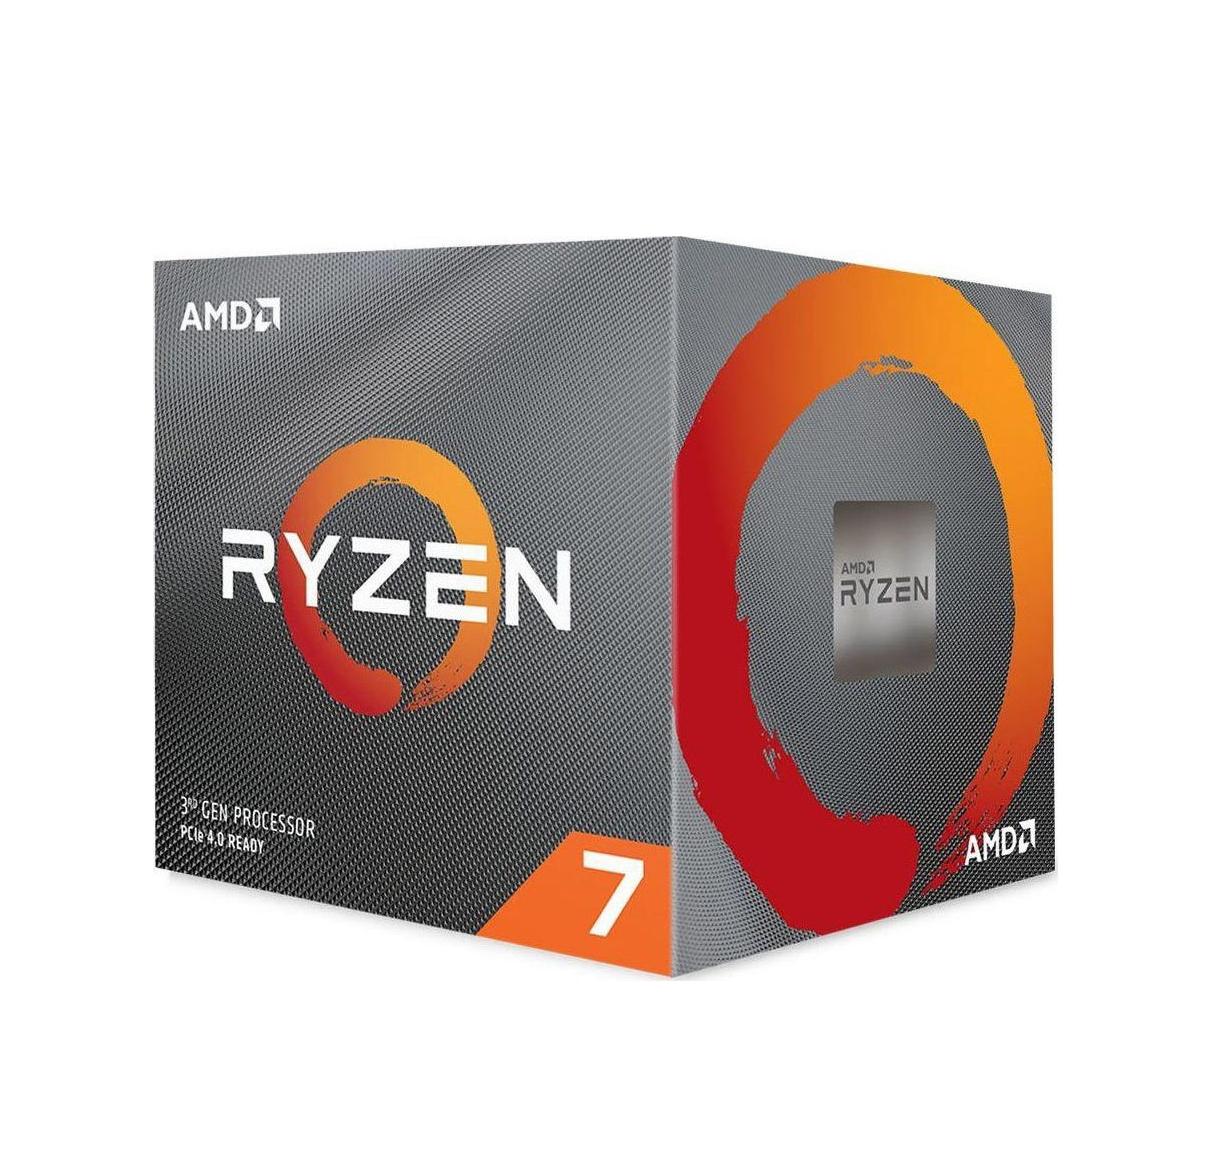 AMD Ryzen 7 3700X Box Επεξεργαστής Πληρωμή έως 24 δόσεις